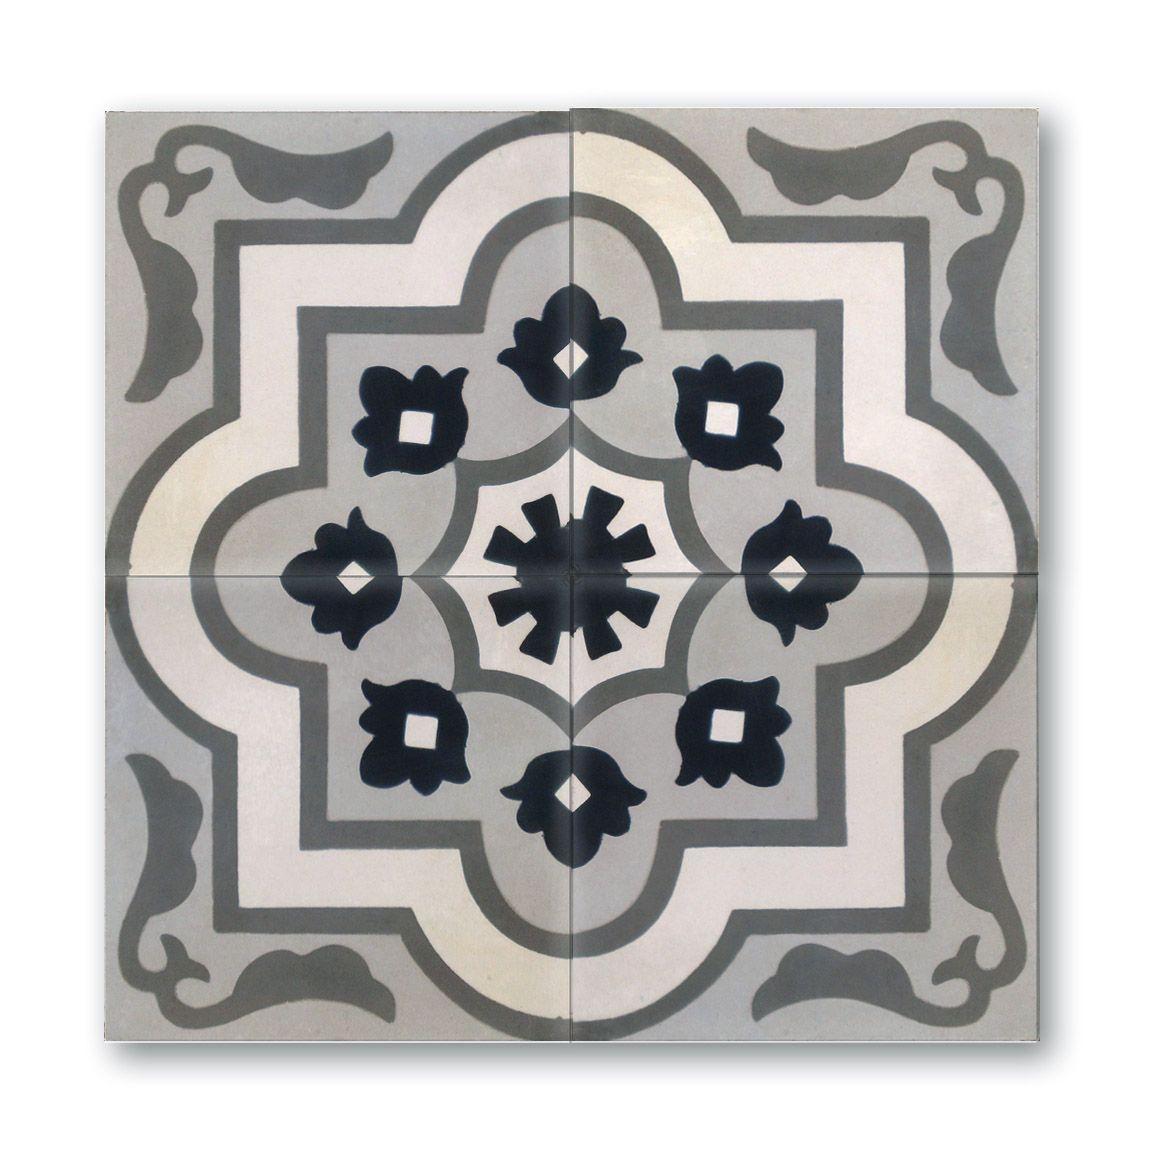 London Apothecary Cement Tiles In Stock Now Tiles Cement Tile Encaustic Tile